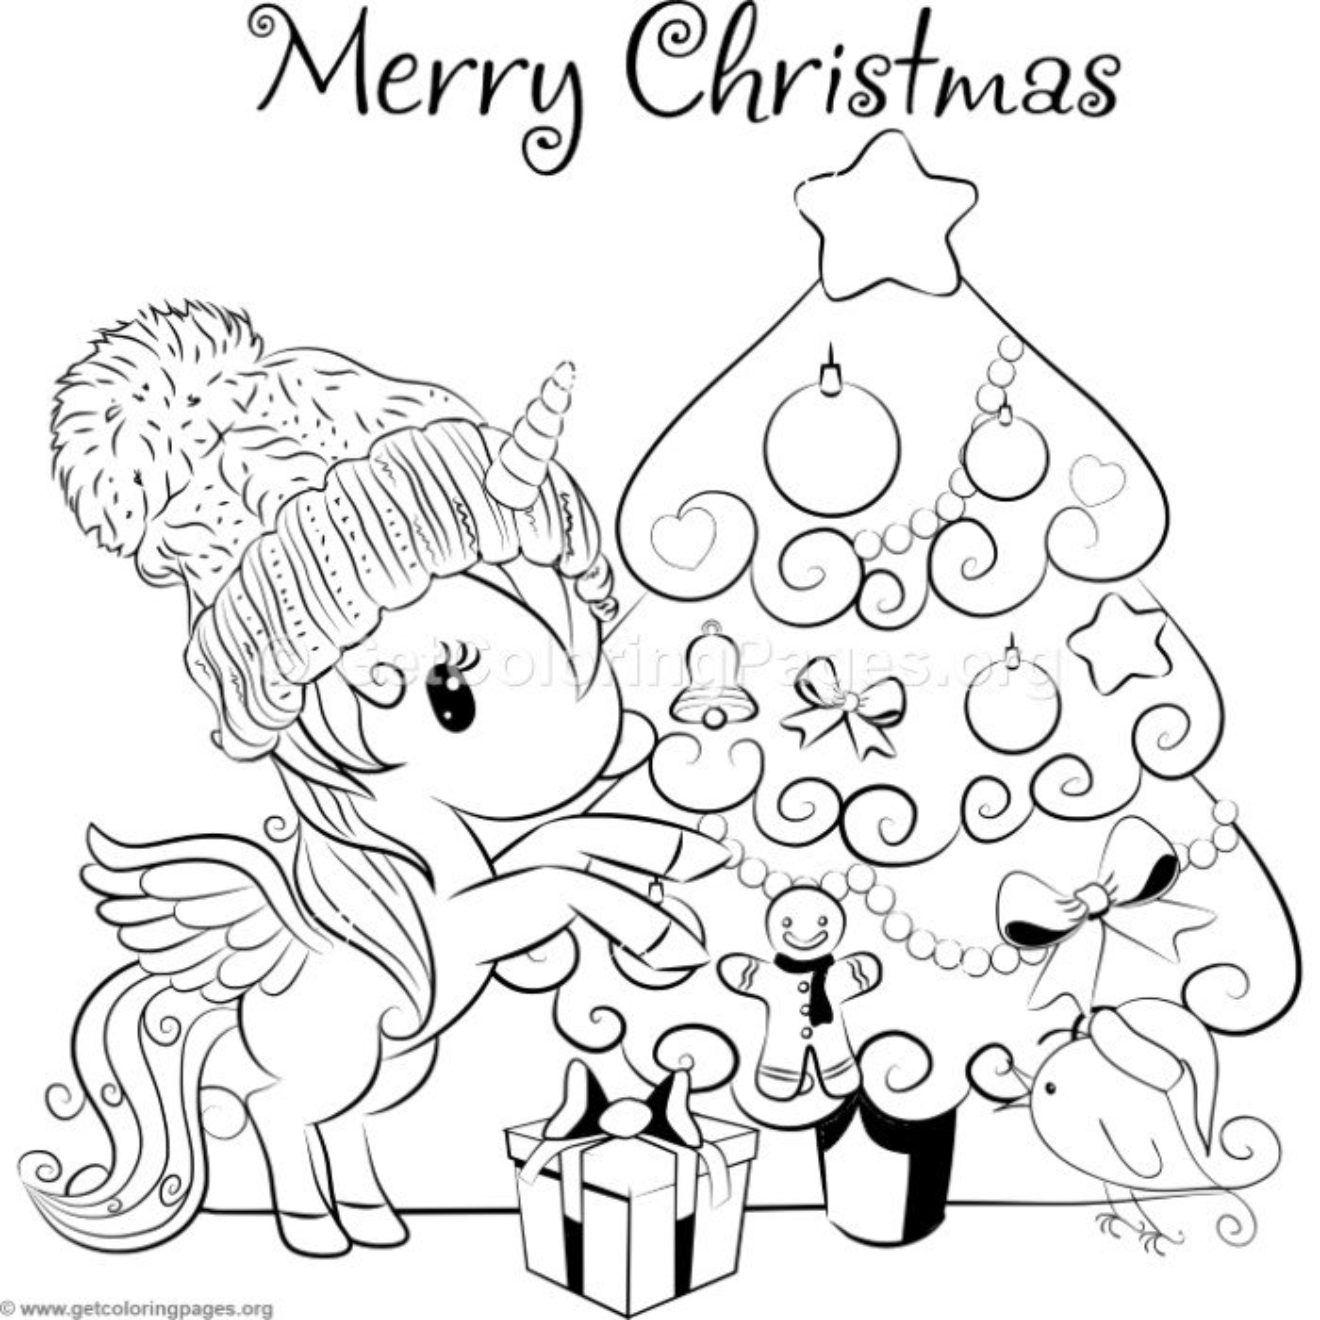 Cartoon Christmas Tree And Unicorn Coloring Pages Getcoloringpages Org Unicorn Coloring Pages Christmas Unicorn Christmas Tree Coloring Page